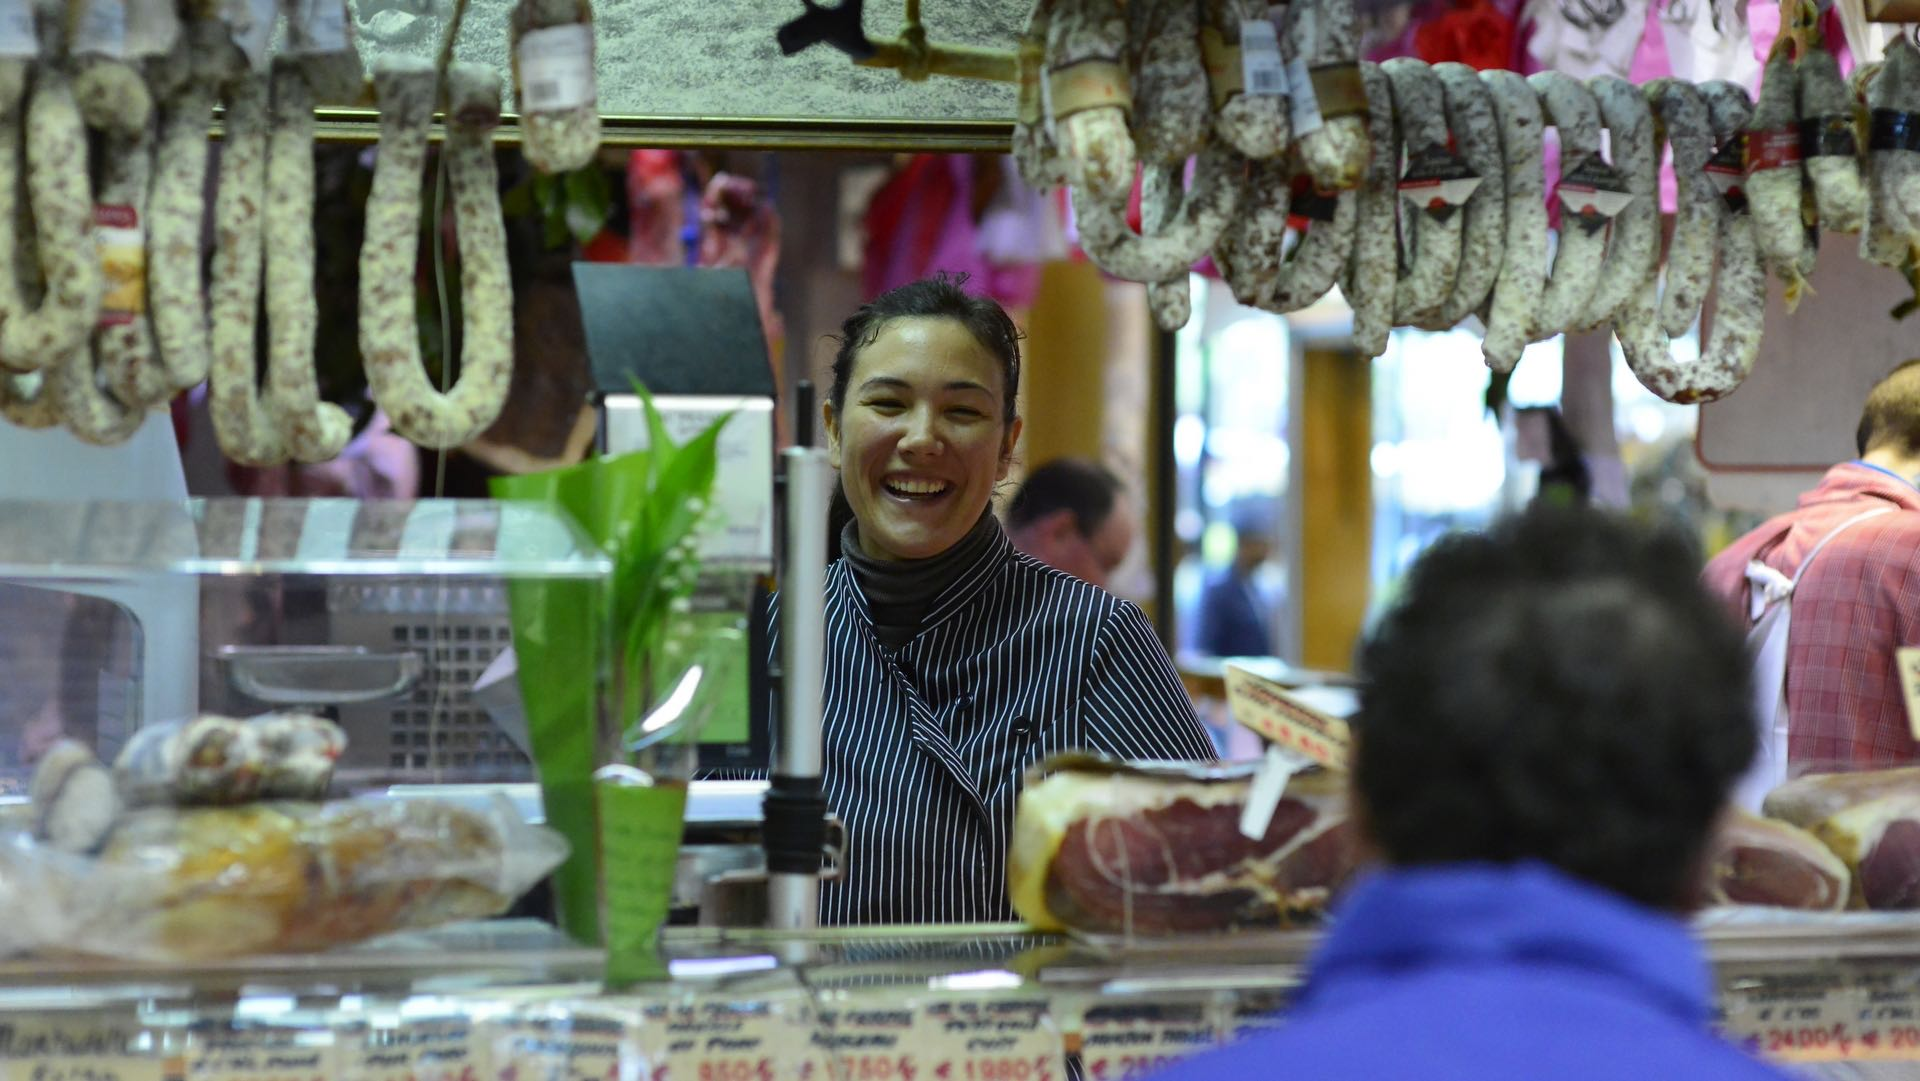 market,marche,seller,smile,tourism,tourguide